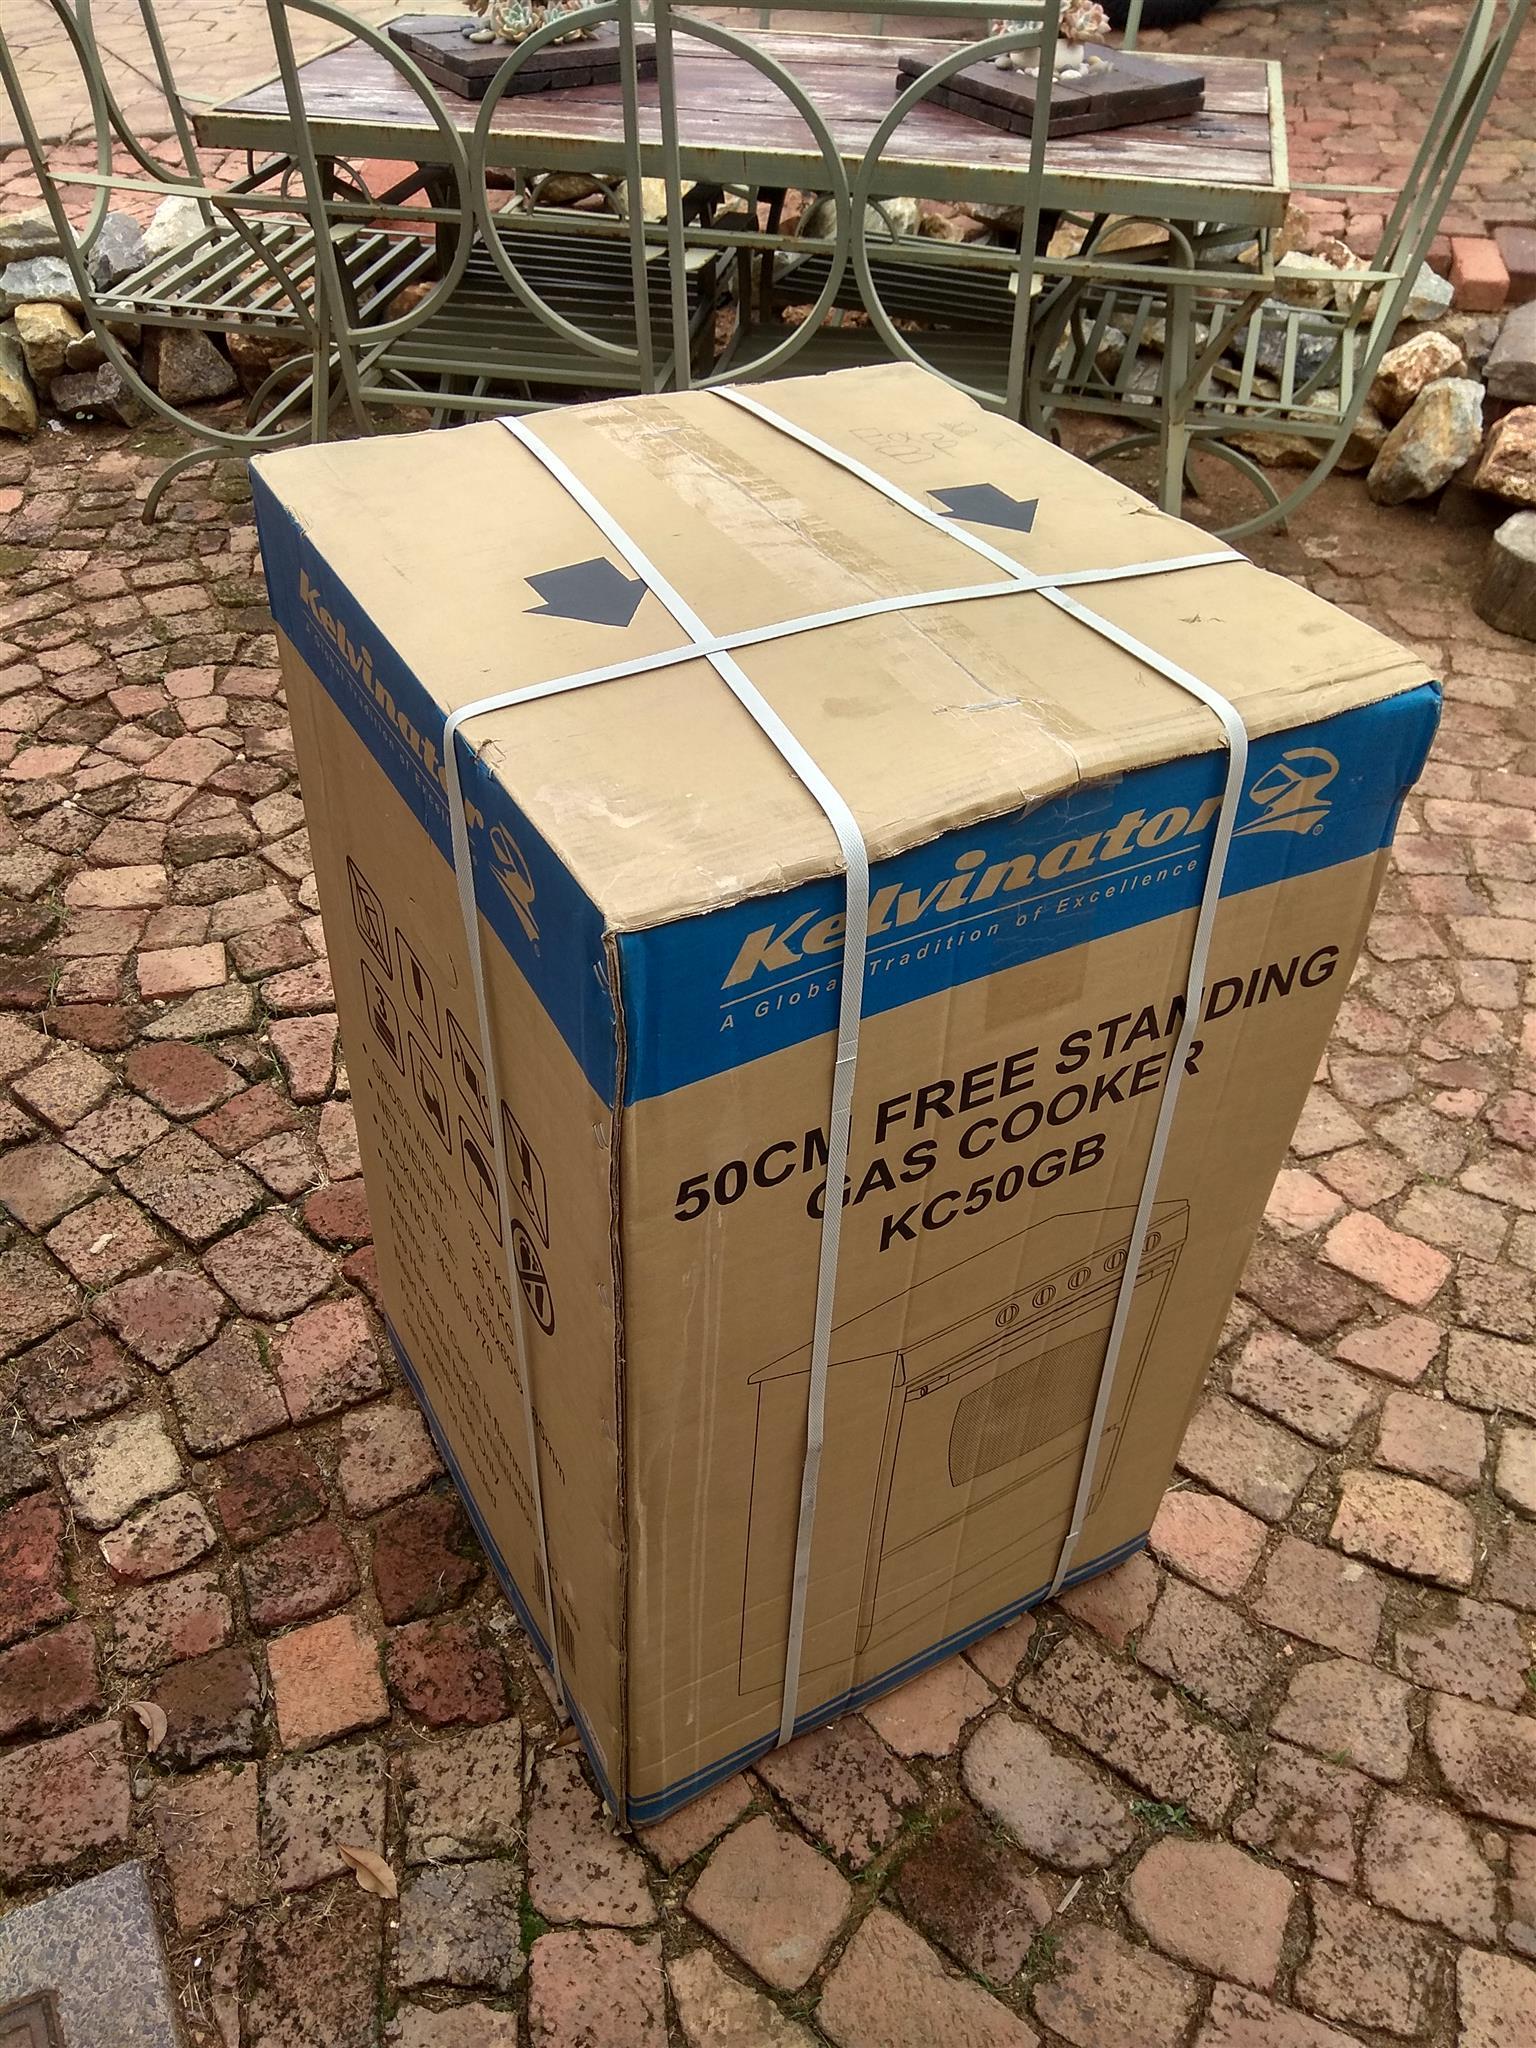 Kelvinator 50cm free standing gas cooker